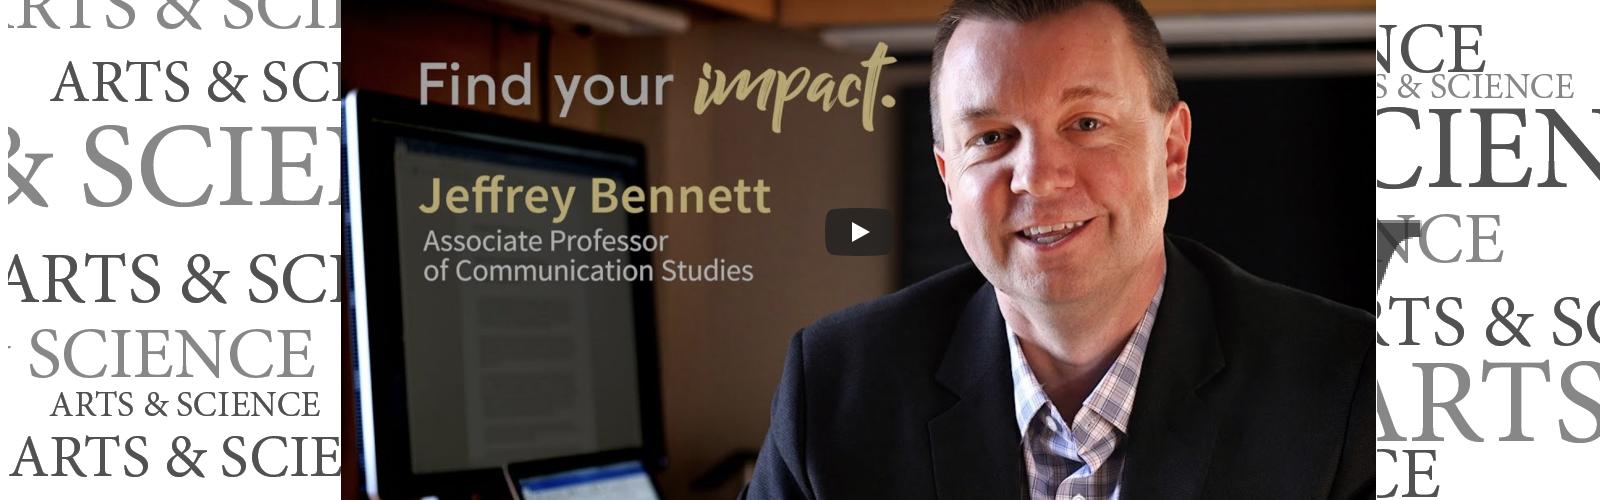 Professor Jeffrey Bennett discusses how words impact treatment of diabetes